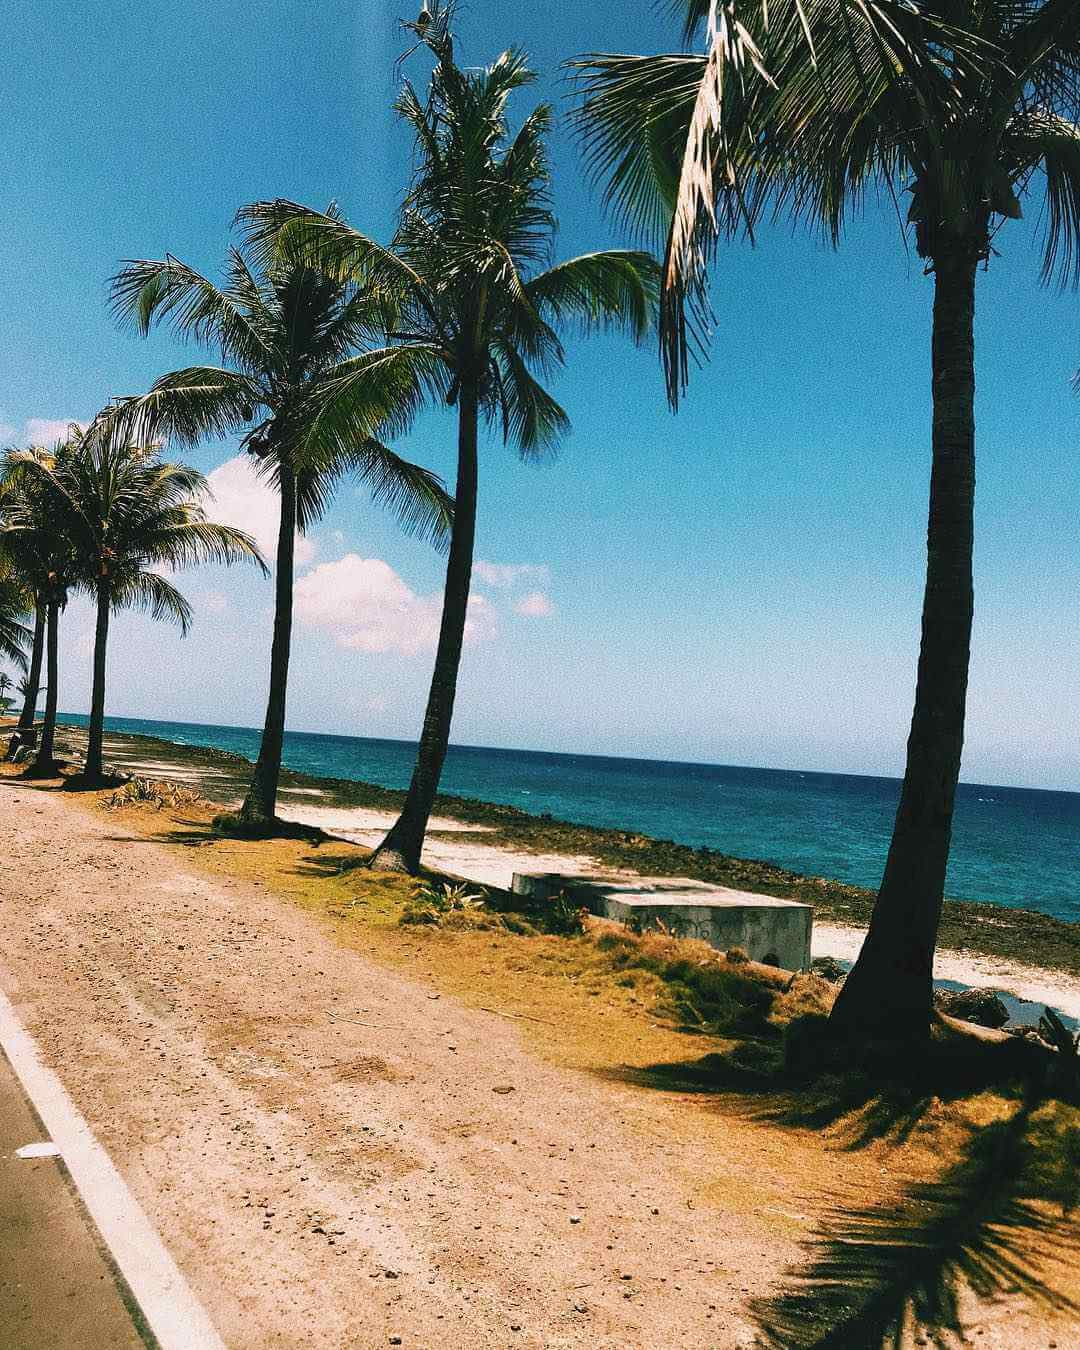 Vuelta a la isla en moto